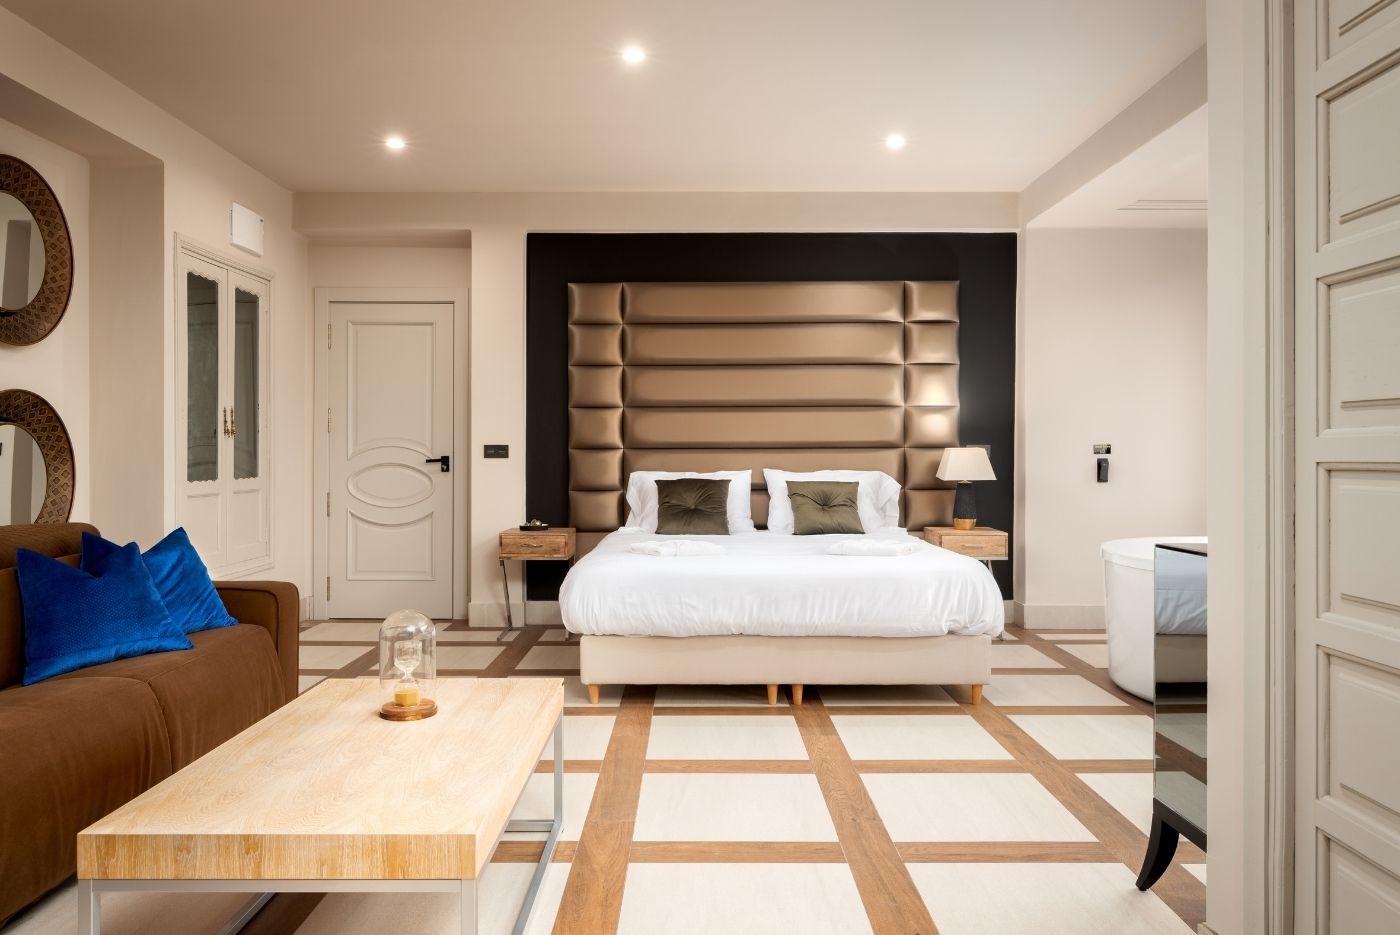 Apartamento-Suite-Deluxe-64-Oviedo-1907-04